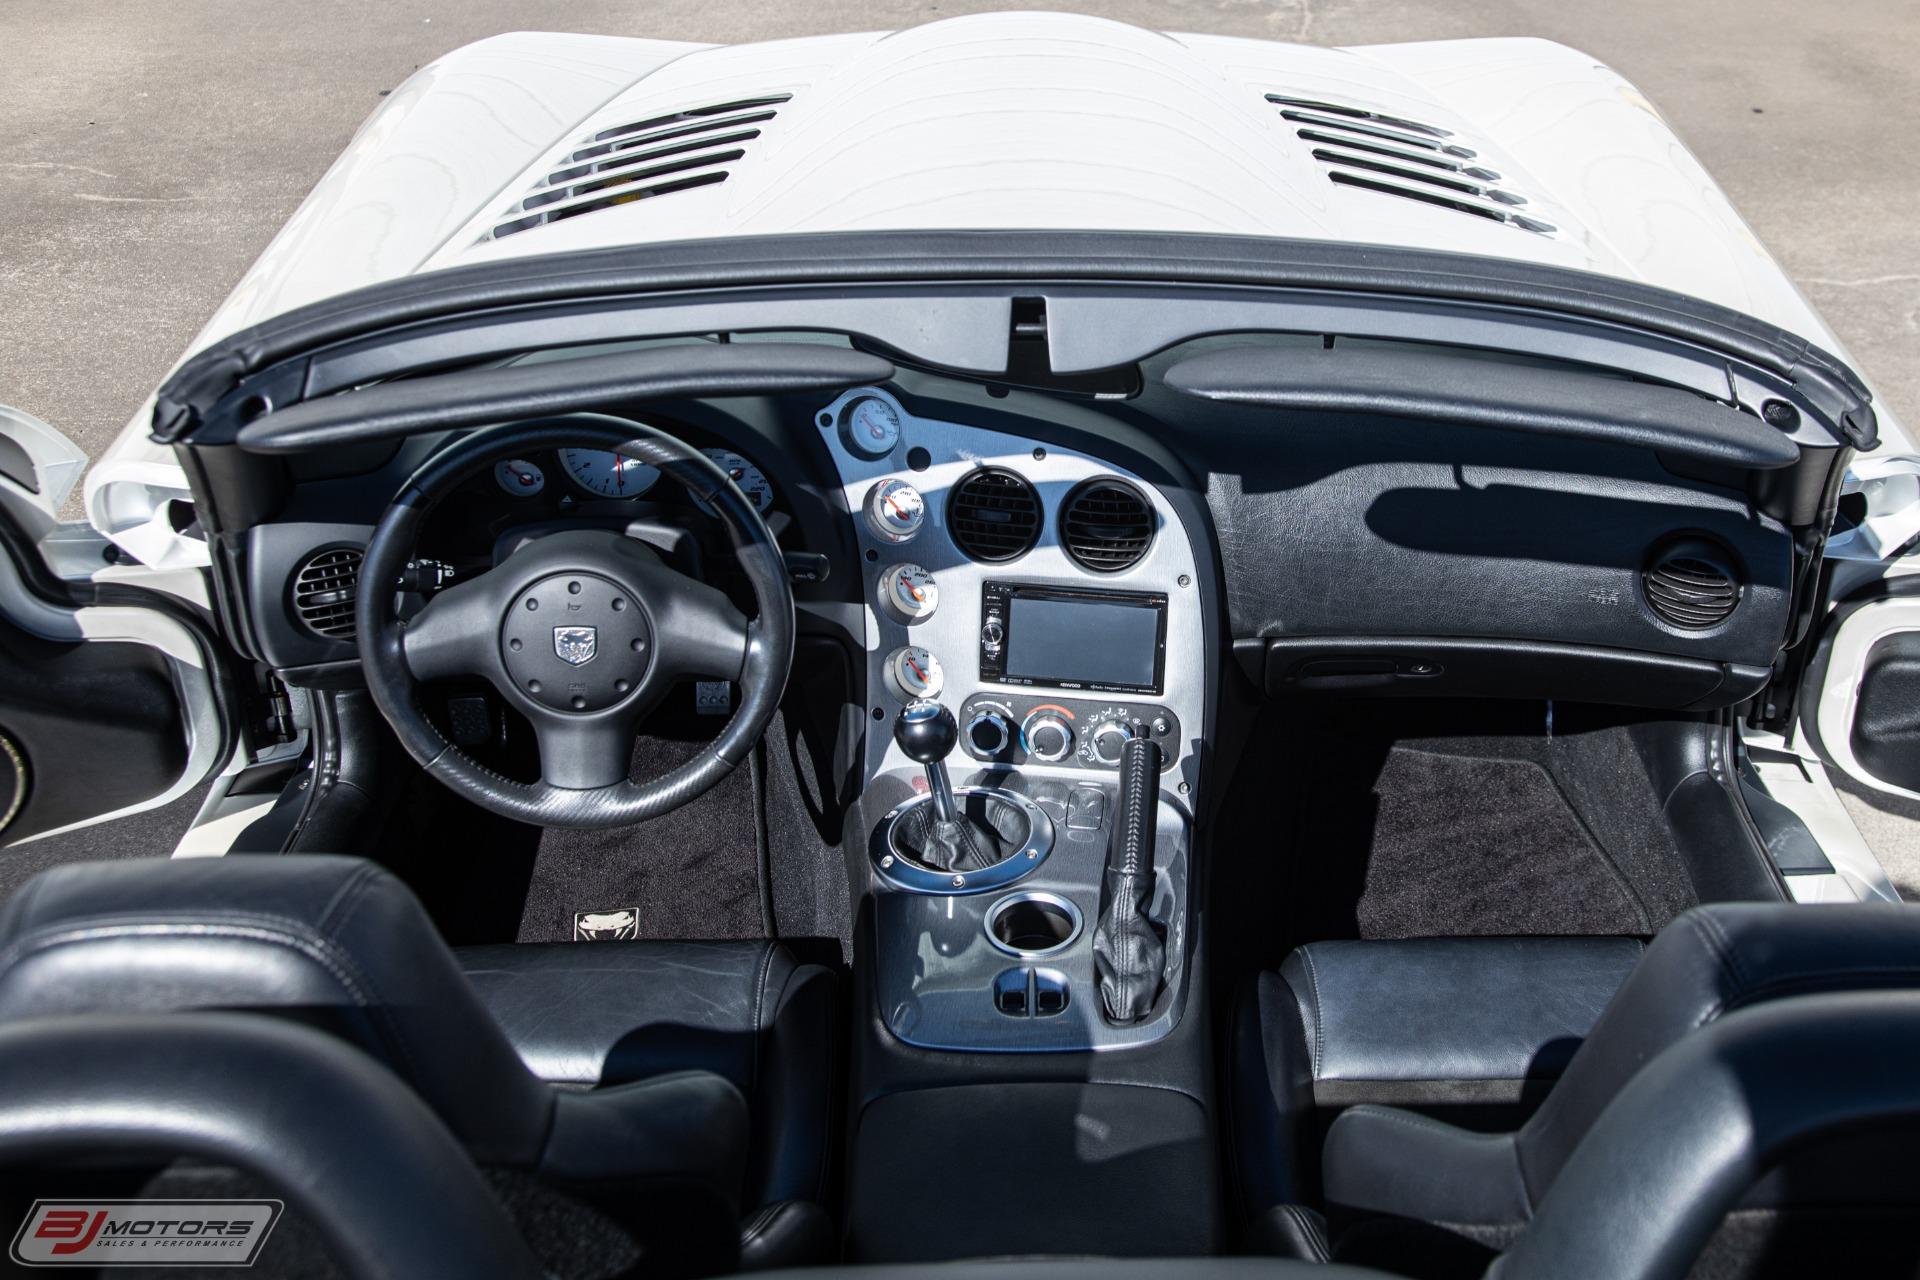 Used-2004-Dodge-Viper-SRT-10-Supercharged